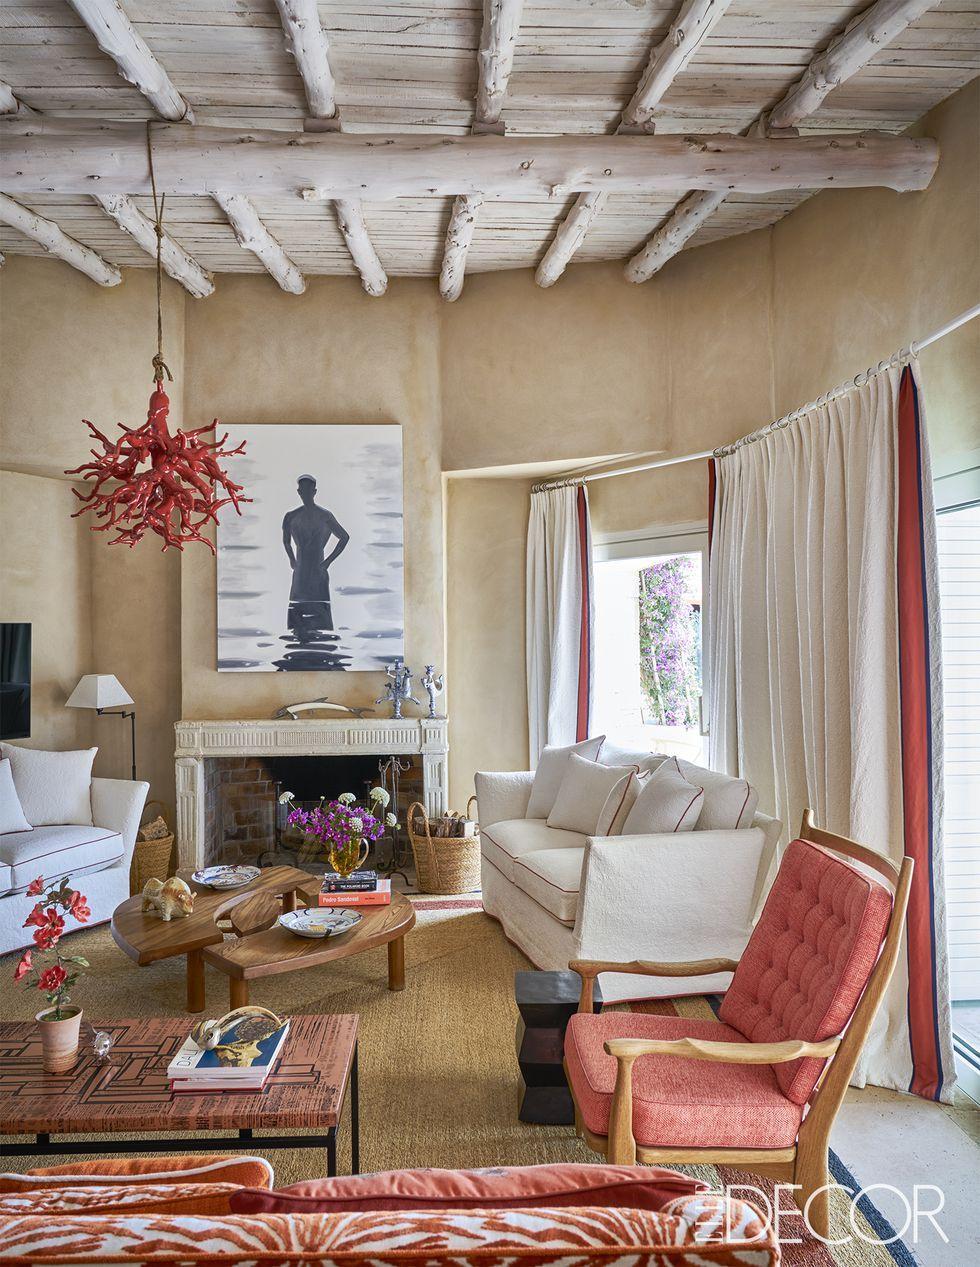 50 Inspiring Curtain Ideas - Window Drapes for Living Rooms on Living Room Curtains Ideas  id=25760